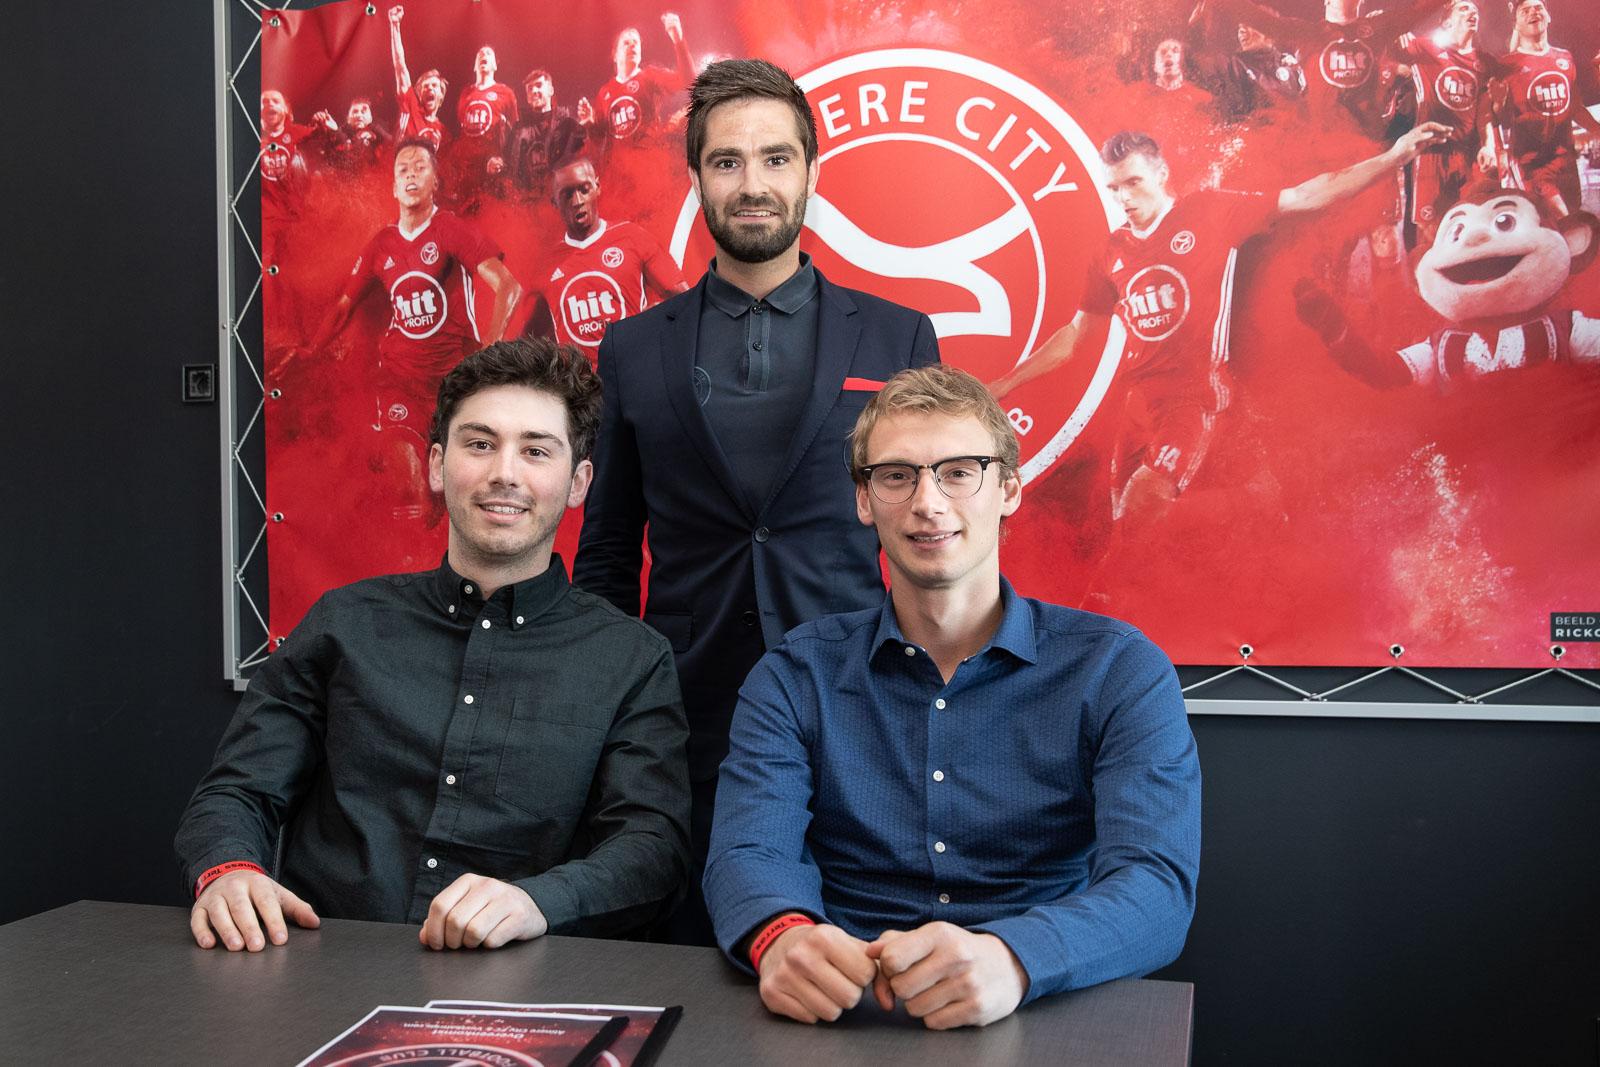 Voetbaltrips.com terug als sponsor Almere City FC